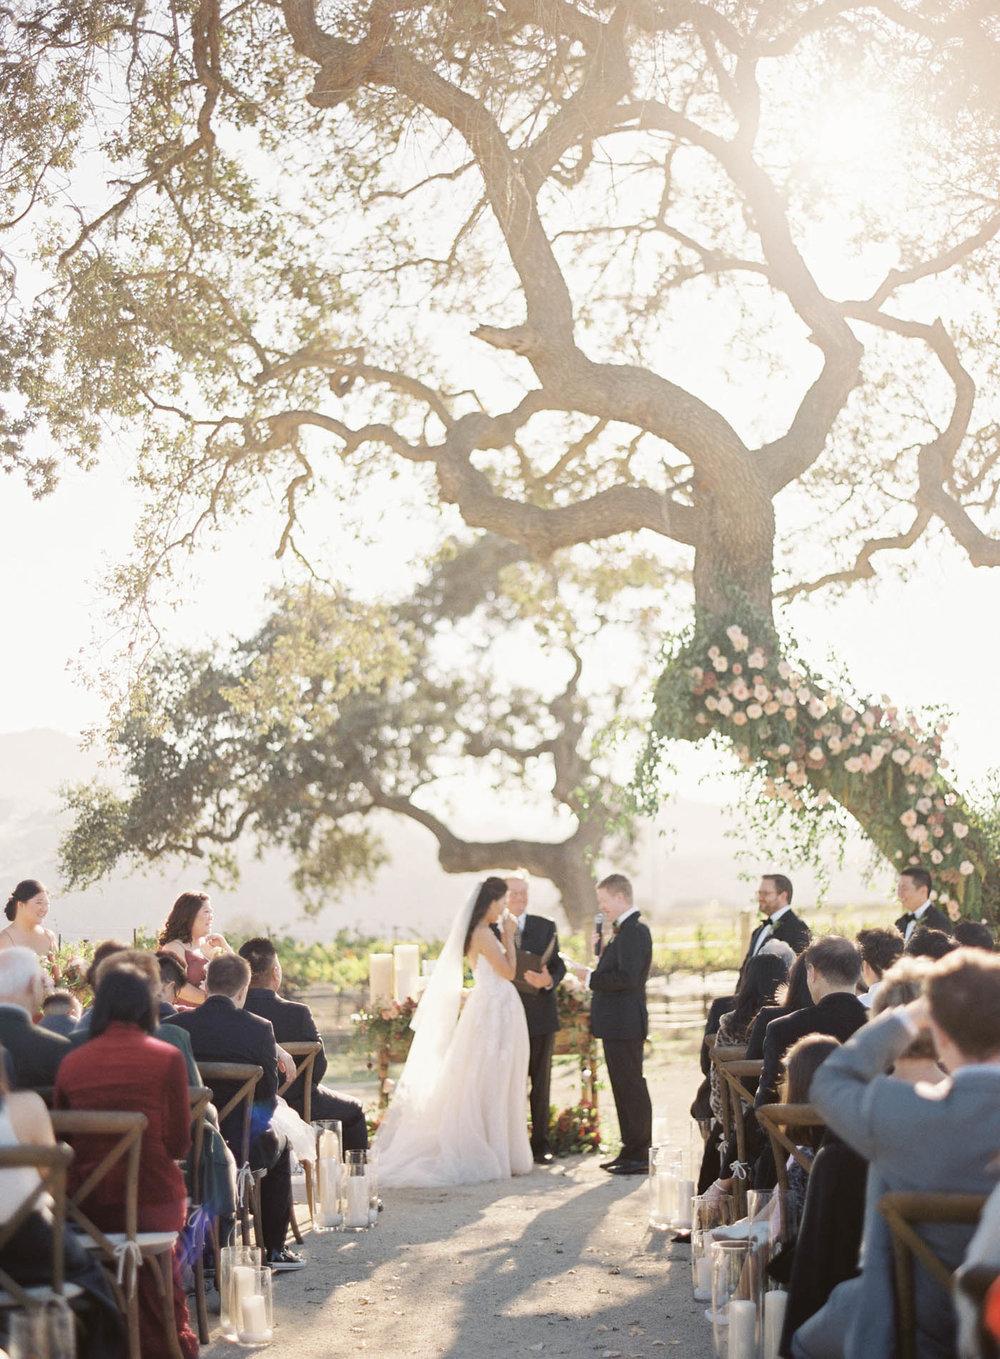 sunstone-villa-wedding-17-Jen_Huang-RD-80-Jen_Huang-009576-R1-016.jpg